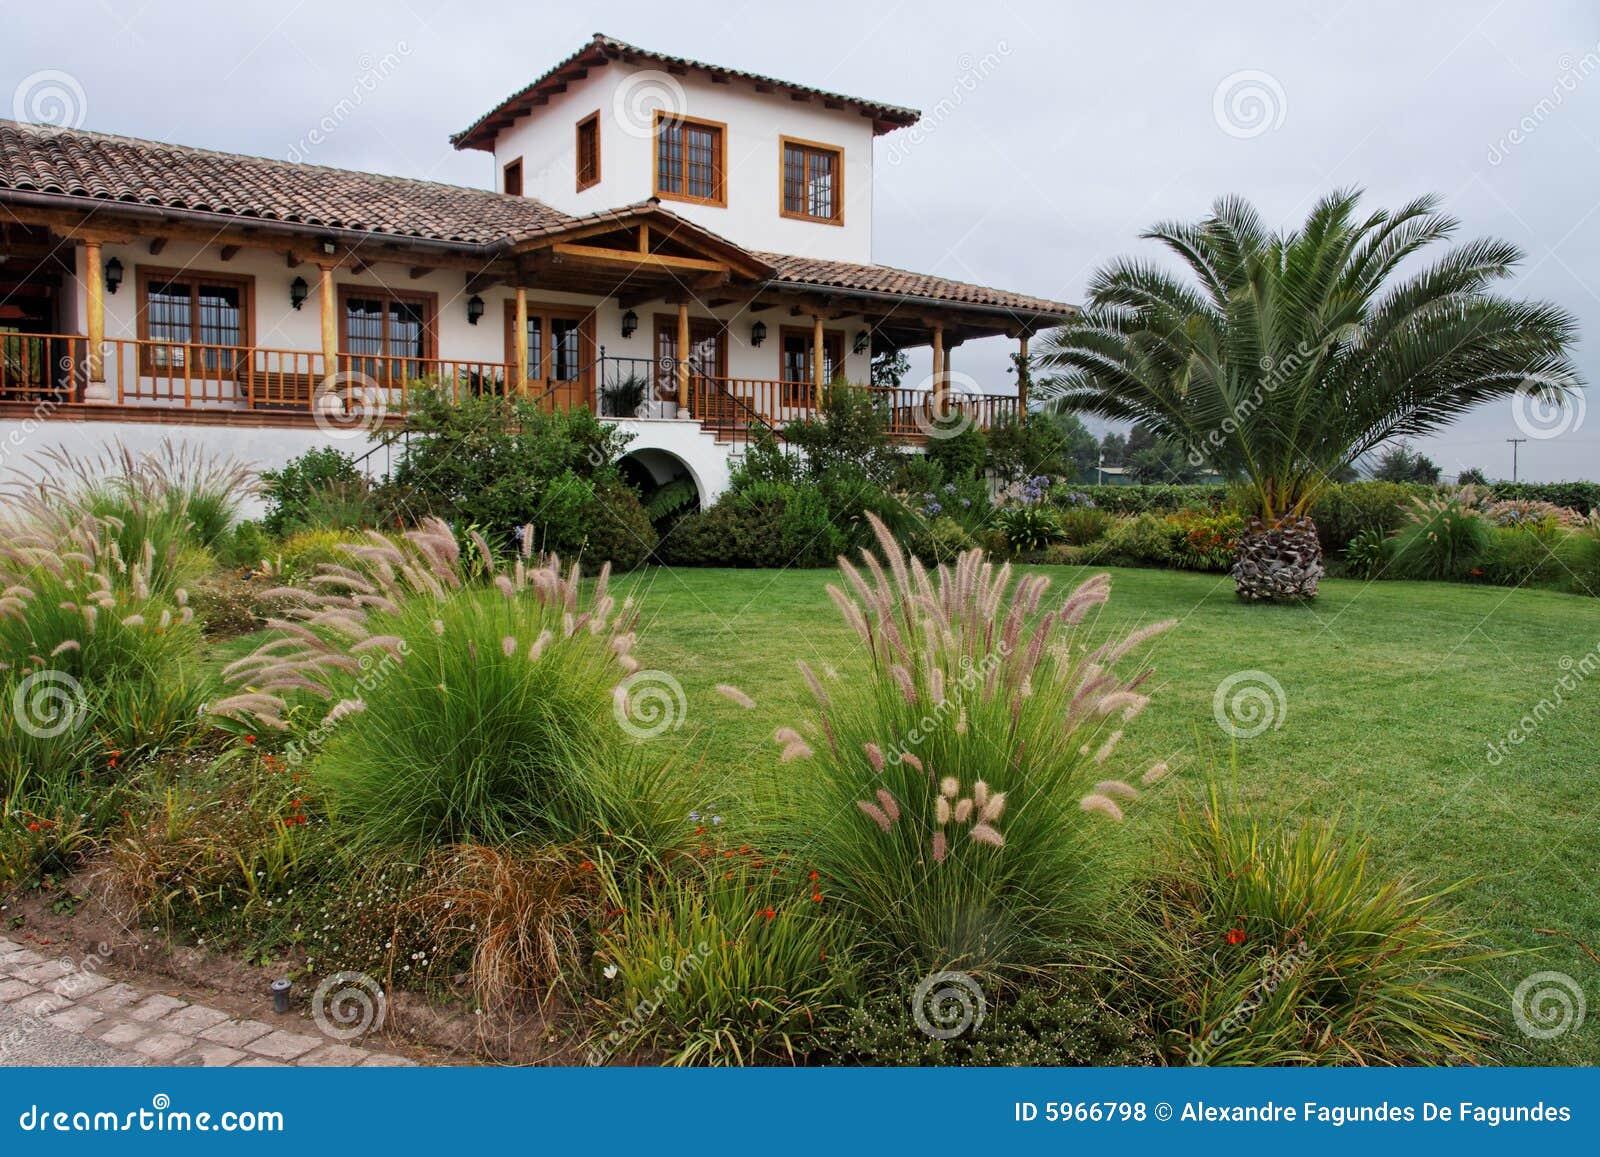 Jardim da casa de campo fotos de stock royalty free imagem 5966798 - Casas de campo con jardin ...